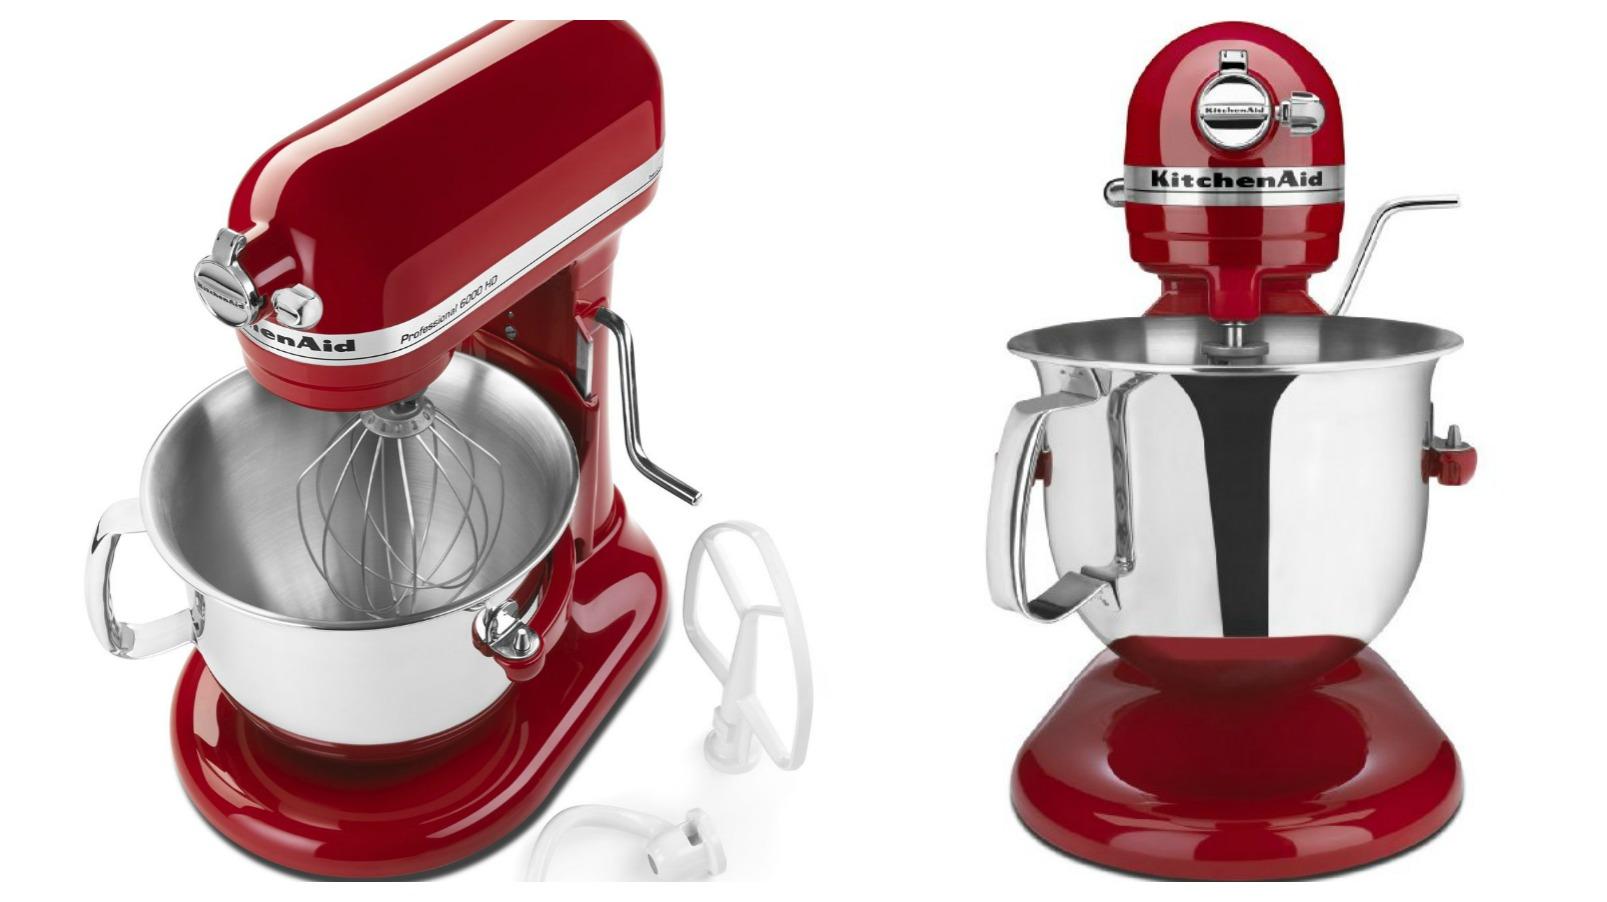 Amazon Offers The Professional 6 Qt Kitchenaid Stand Mixer